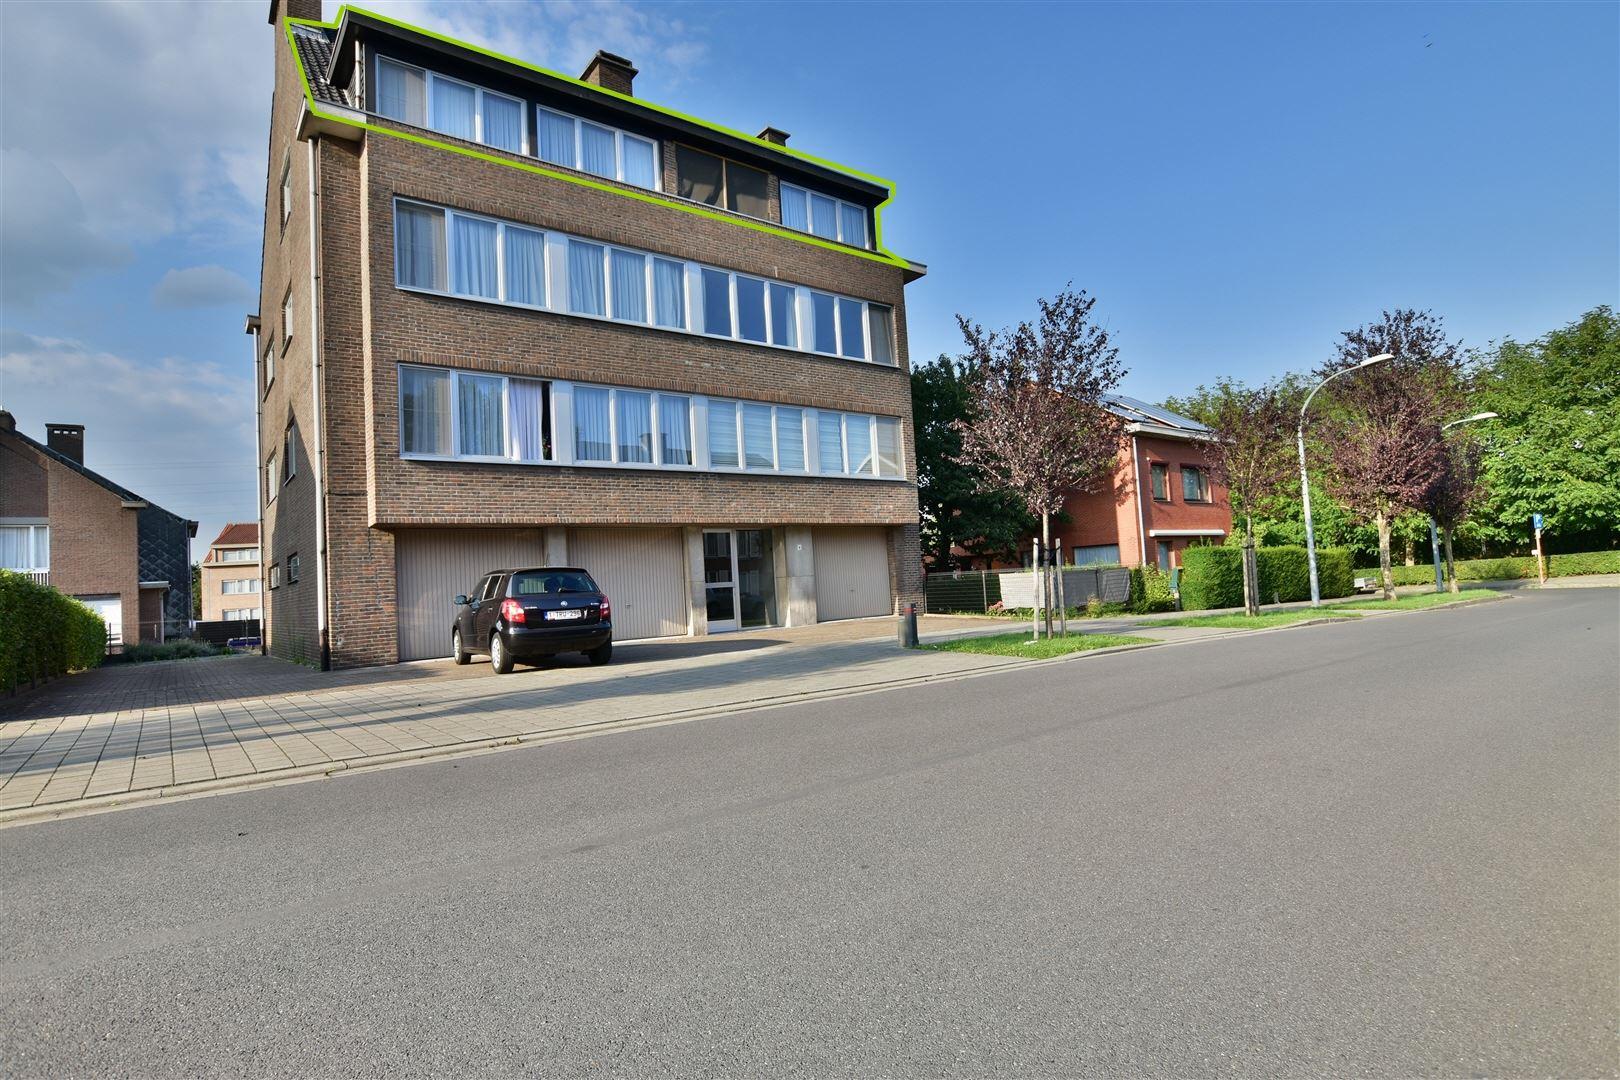 Foto 10 : Appartement te 9140 TEMSE (België) - Prijs € 299.000